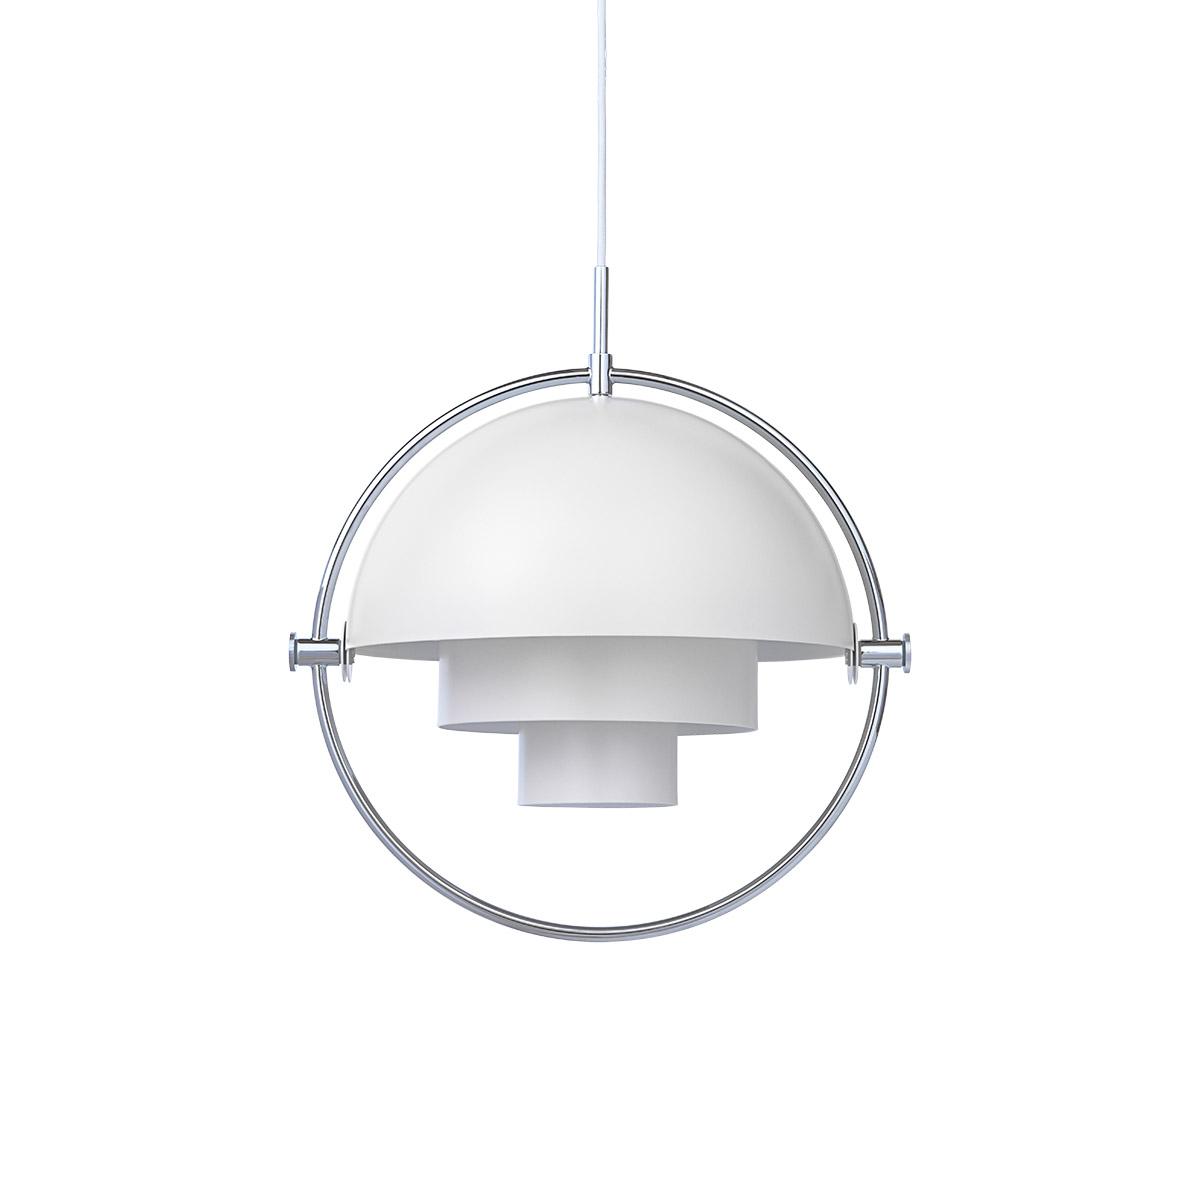 Multi-Lite Taklampe Hvit/Krom